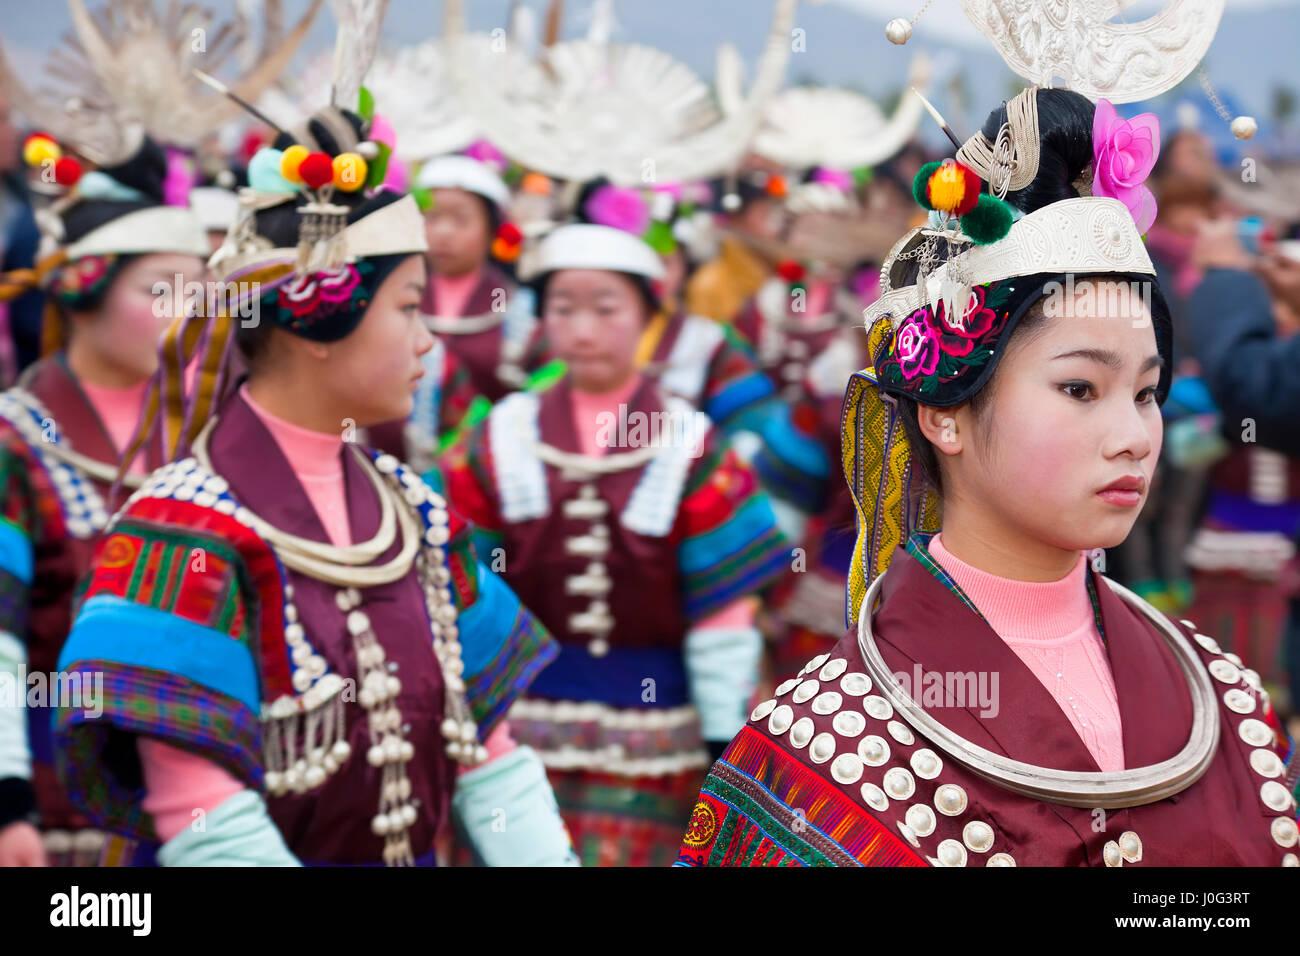 Miao negro niñas bailando en el festival, Kaili, de la provincia de Guizhou, China Imagen De Stock